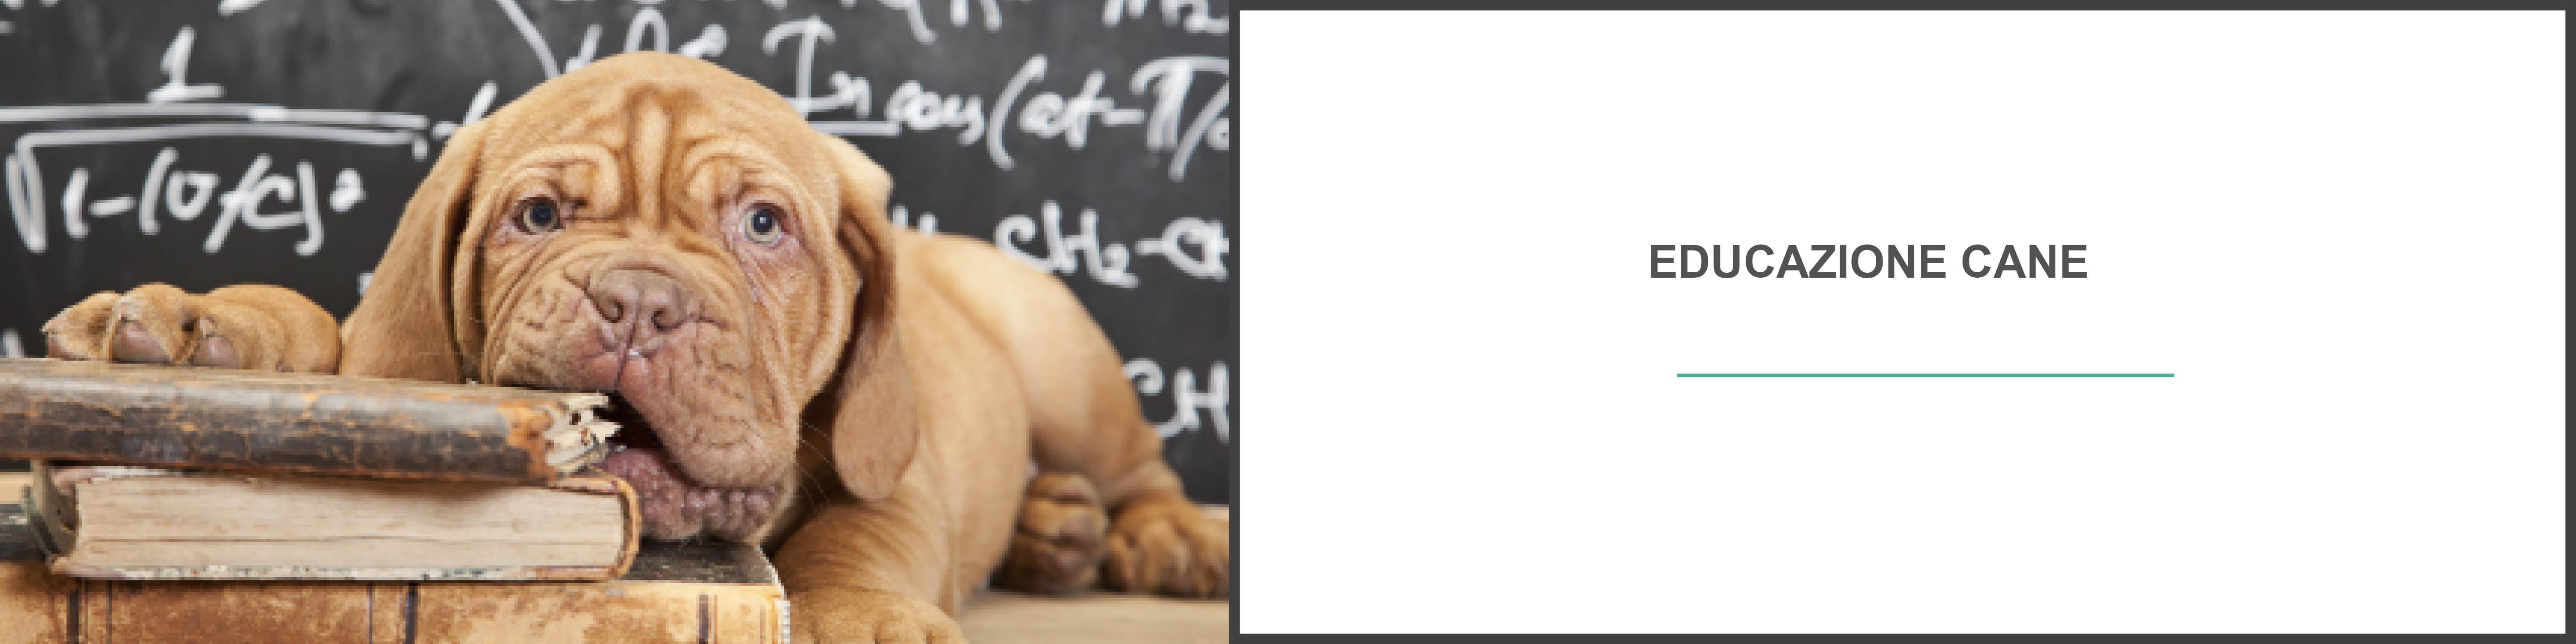 blog cani : educazione cane, educare